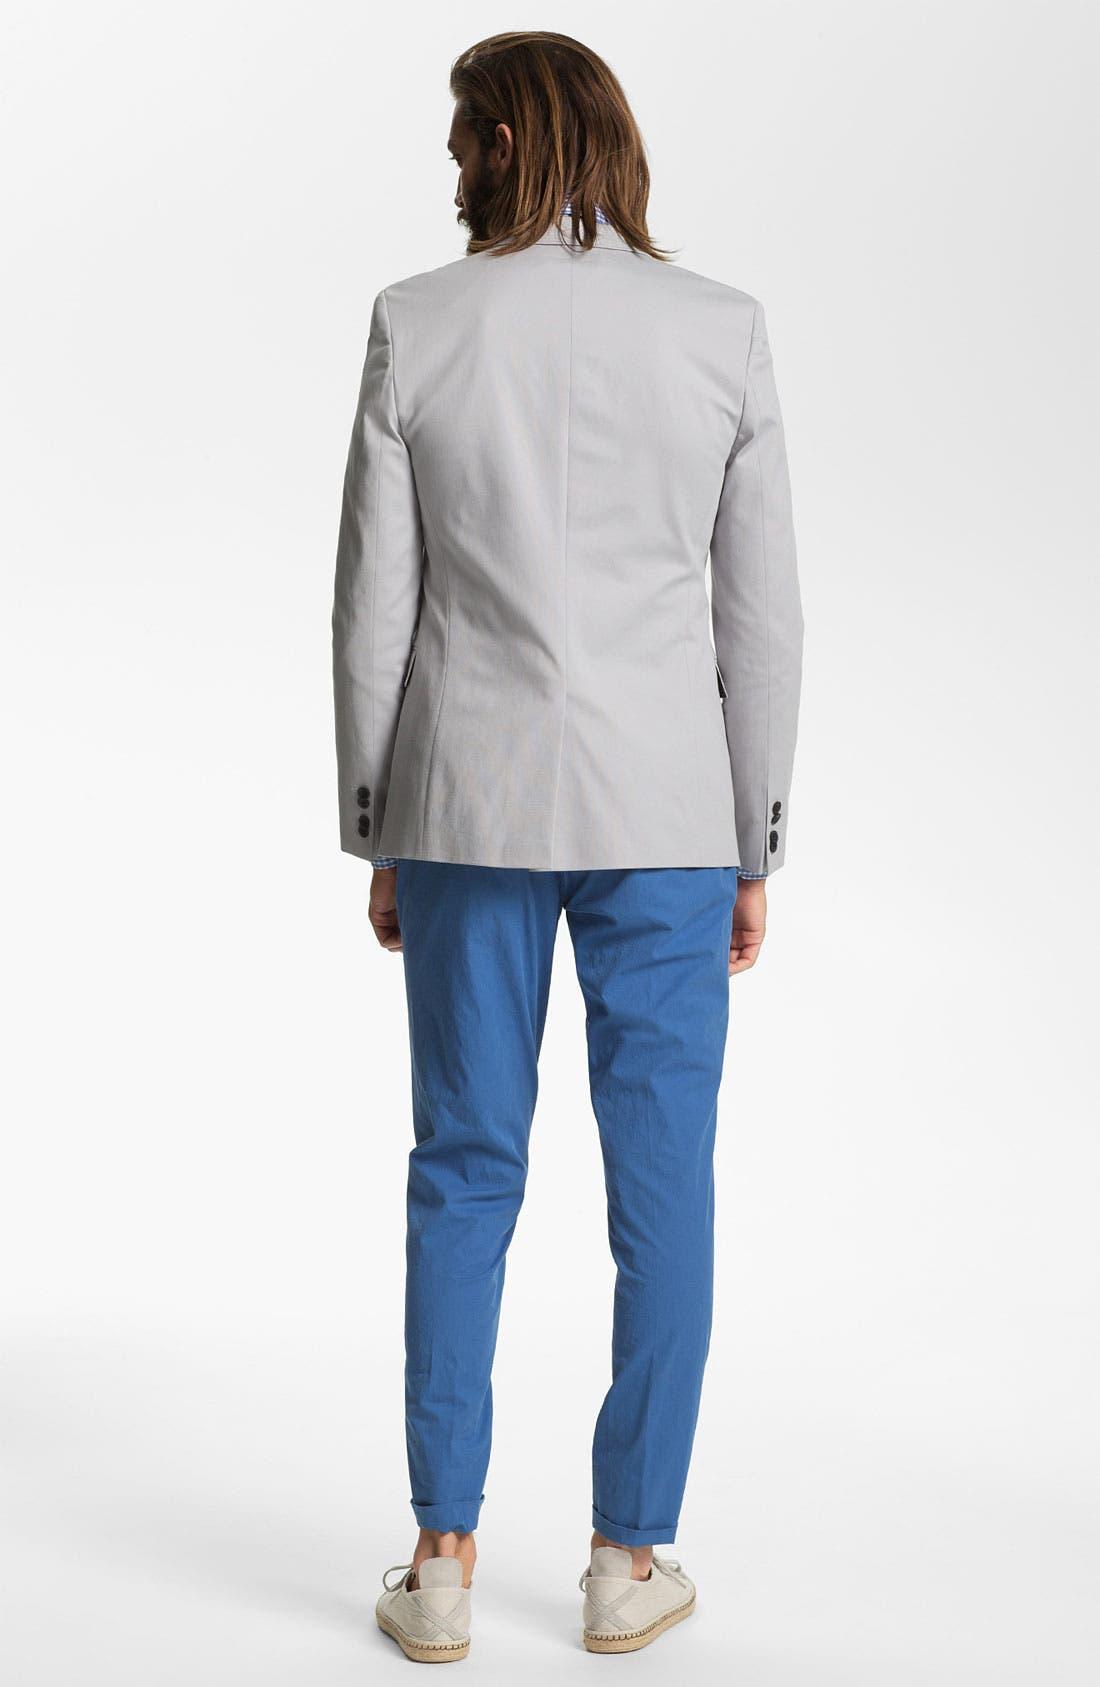 ZZDNUHUGO BOSS, HUGO 'Aeris' Trim Fit Cotton Blend Blazer, Alternate thumbnail 6, color, 030